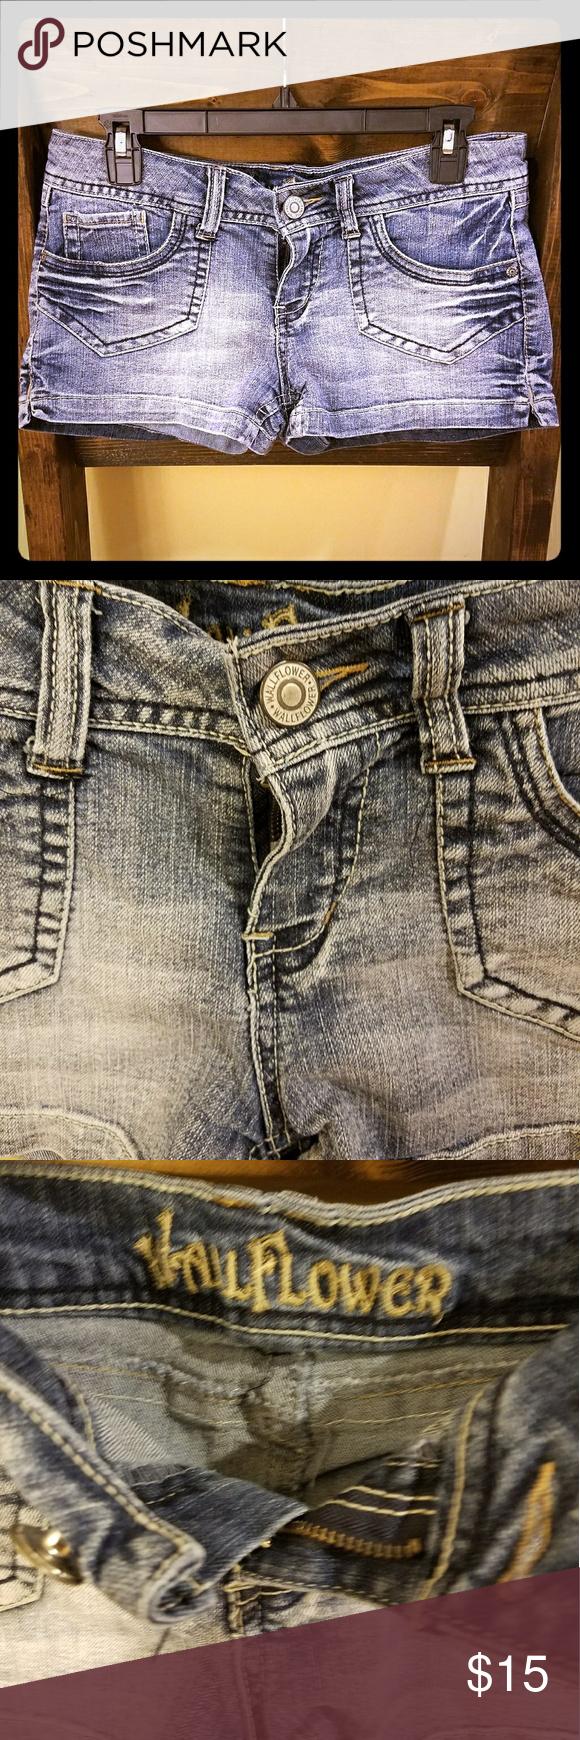 Wallflower denim shorts Juniors size 11 wallflower denim shorts. Wallflower Shorts Jean Shorts